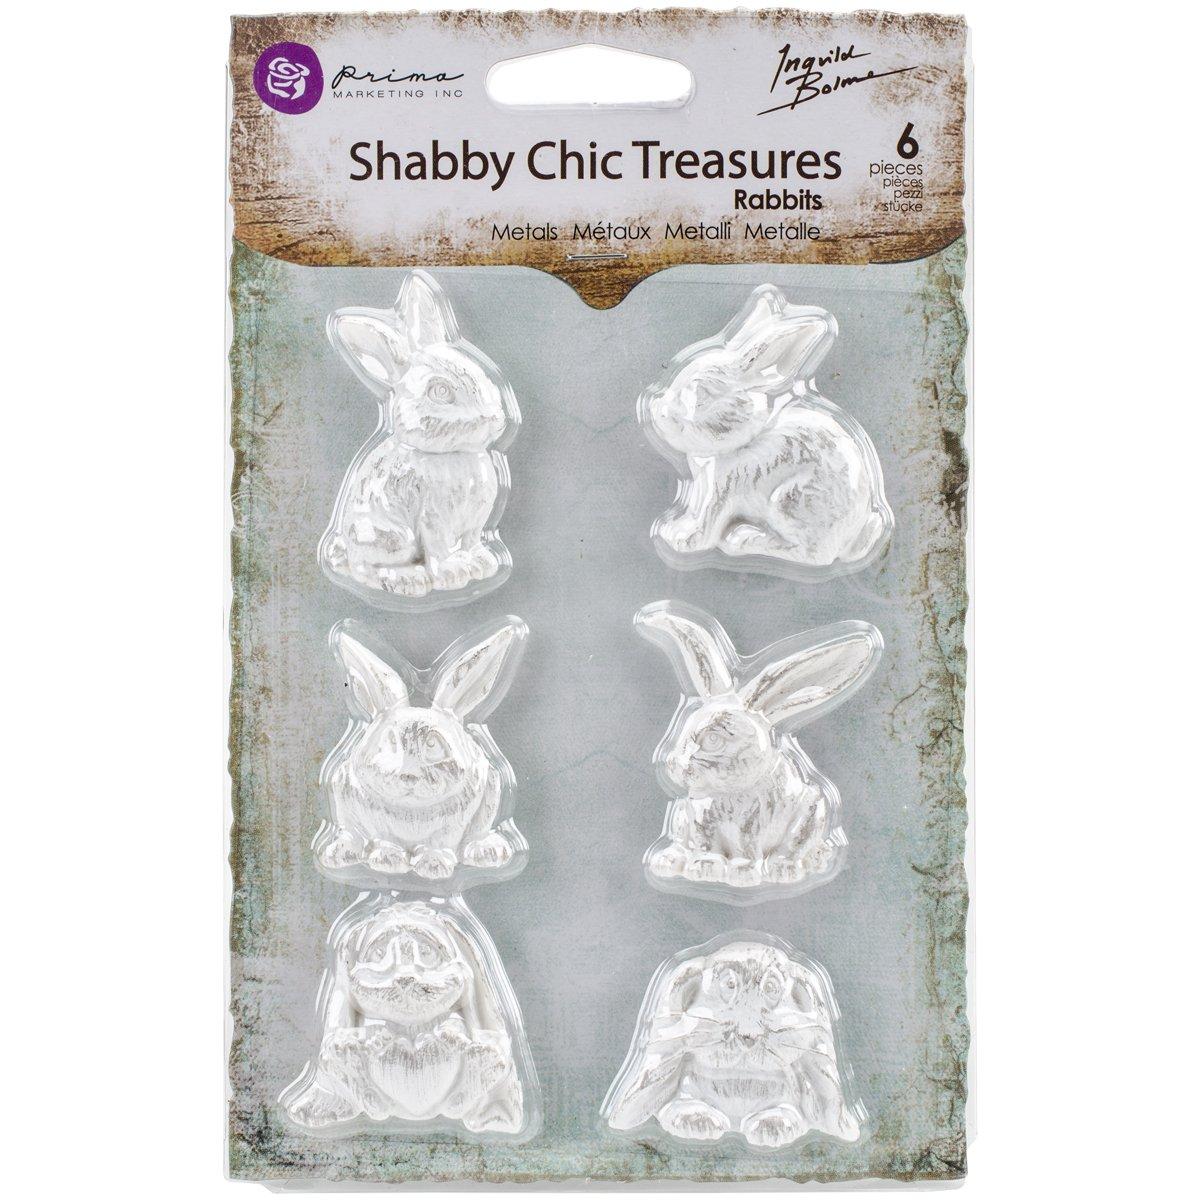 Prima Marketing RE8-92616 Shabby Chic Treasures Resin-Rabbits